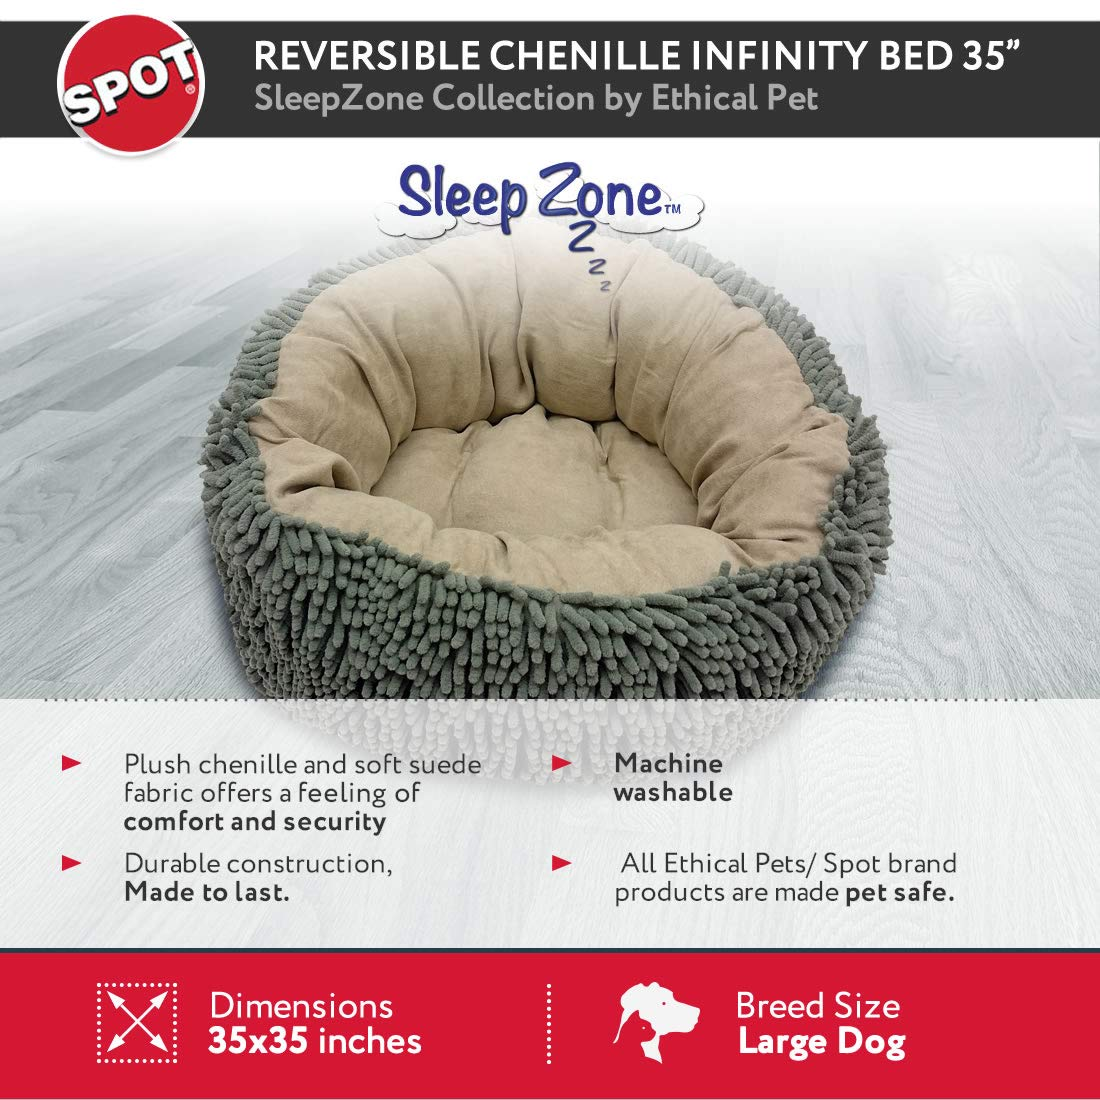 Amazon.com: Ética mascotas sueño Zone Reversible infinity ...